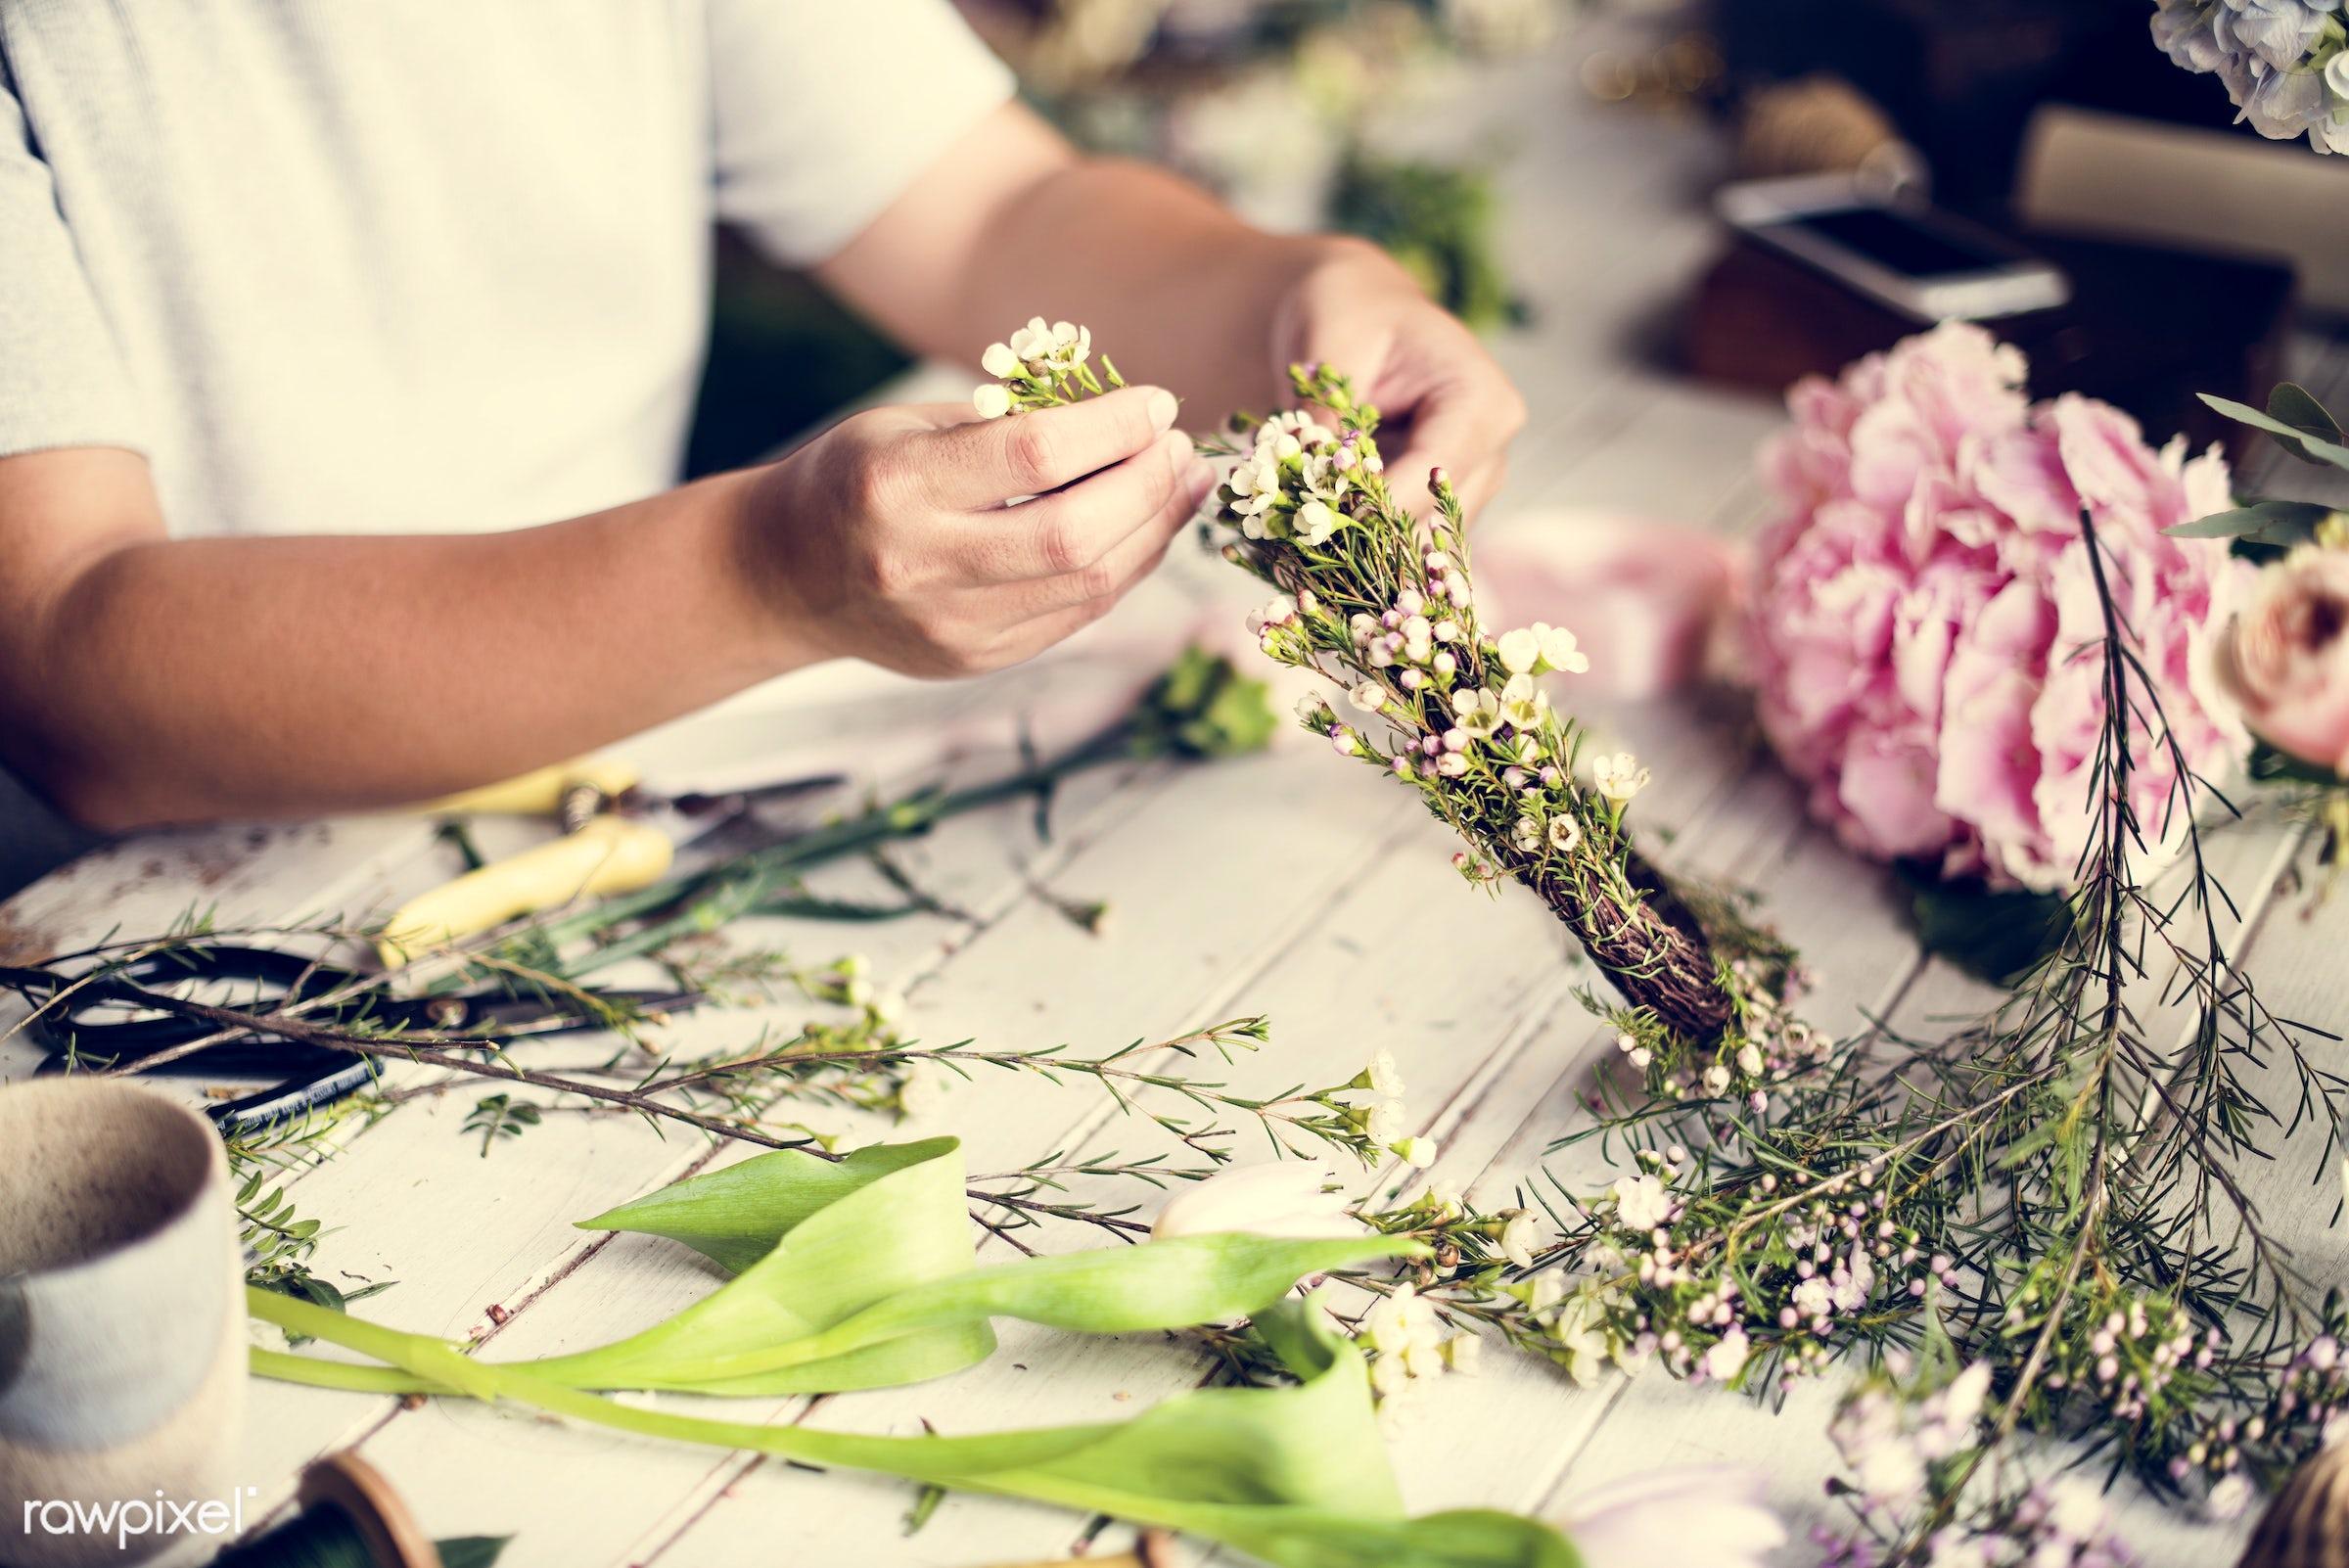 shop, detail, person, people, wax flower, decor, nature, woman, flowers, work, refreshment, carnation, florist, present,...